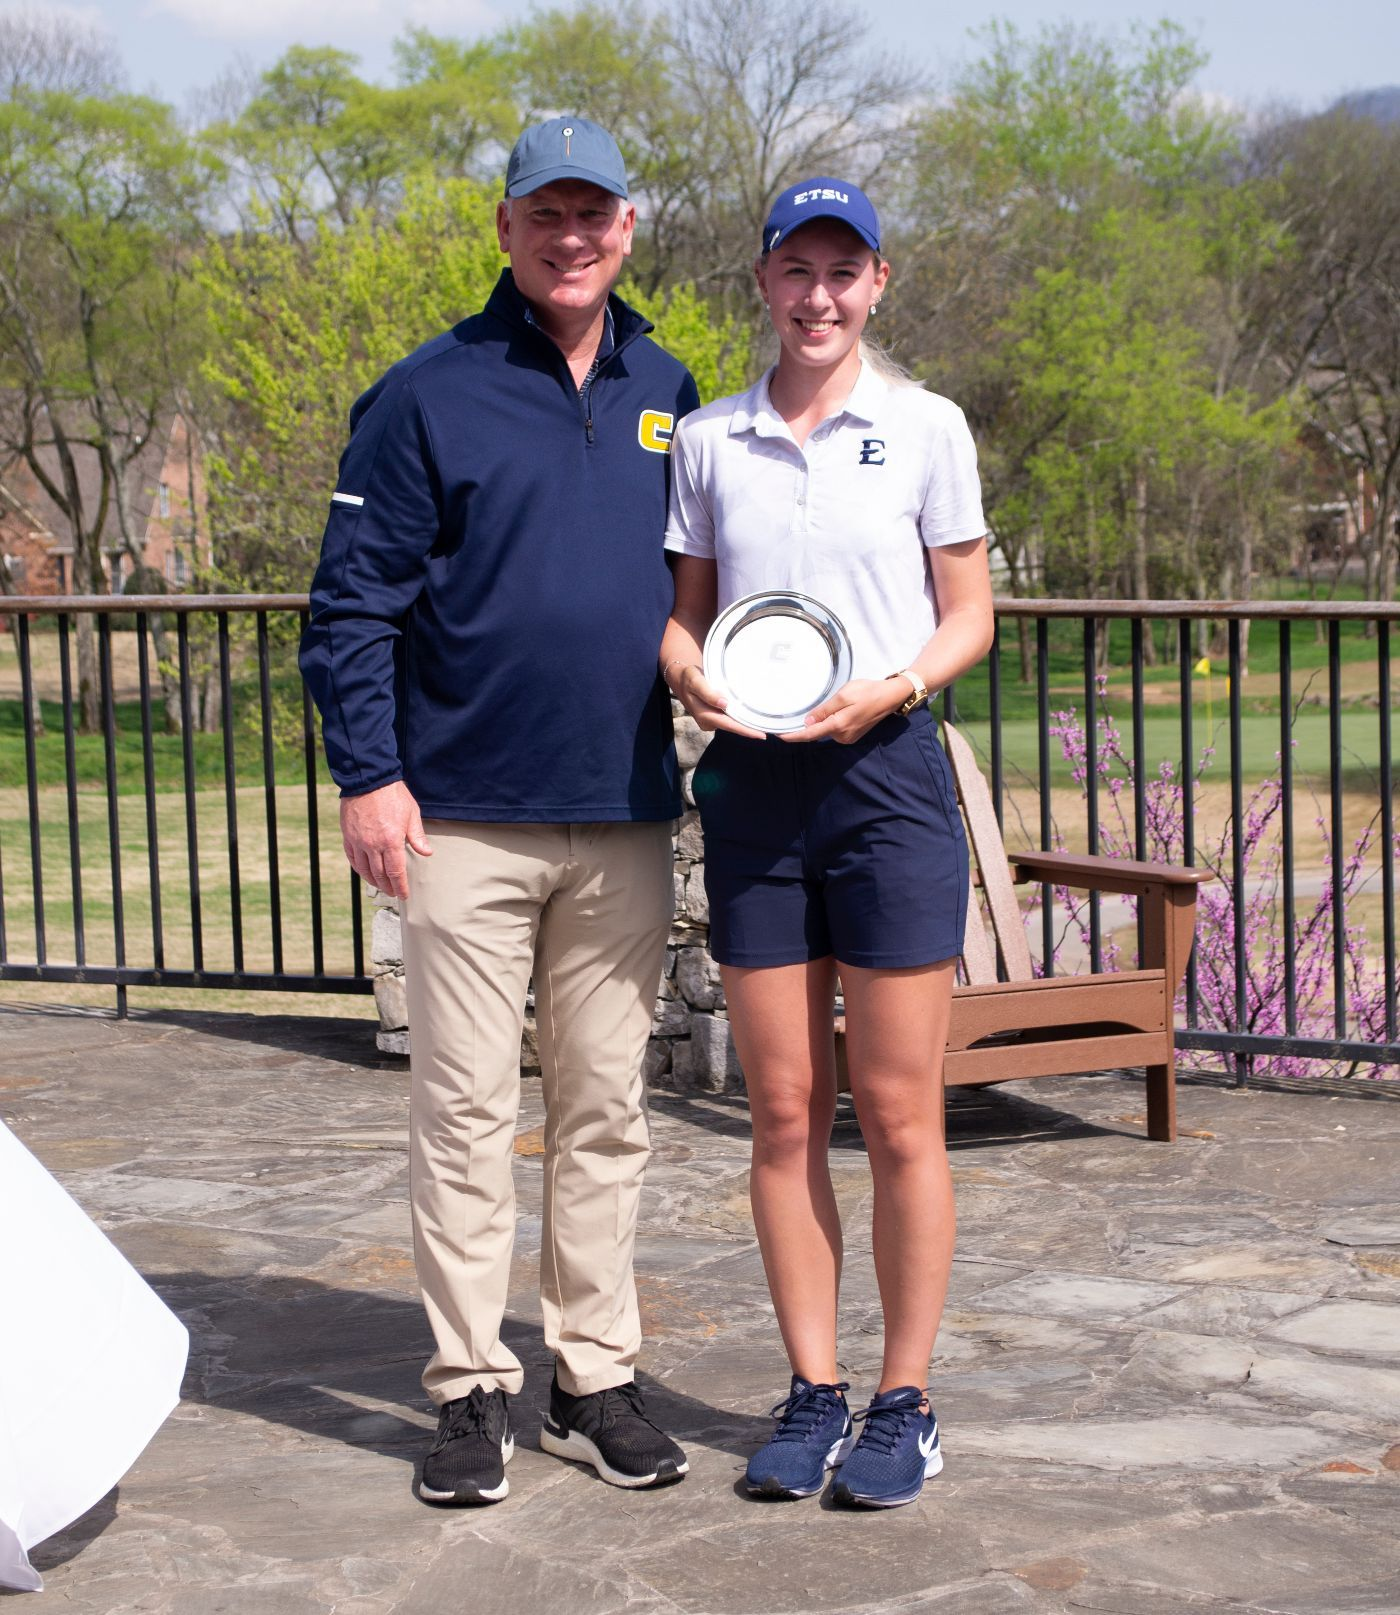 Tereza Melecka won her fourth collegiate tournament. (Photo: Abby Walker/GoMocs.com)